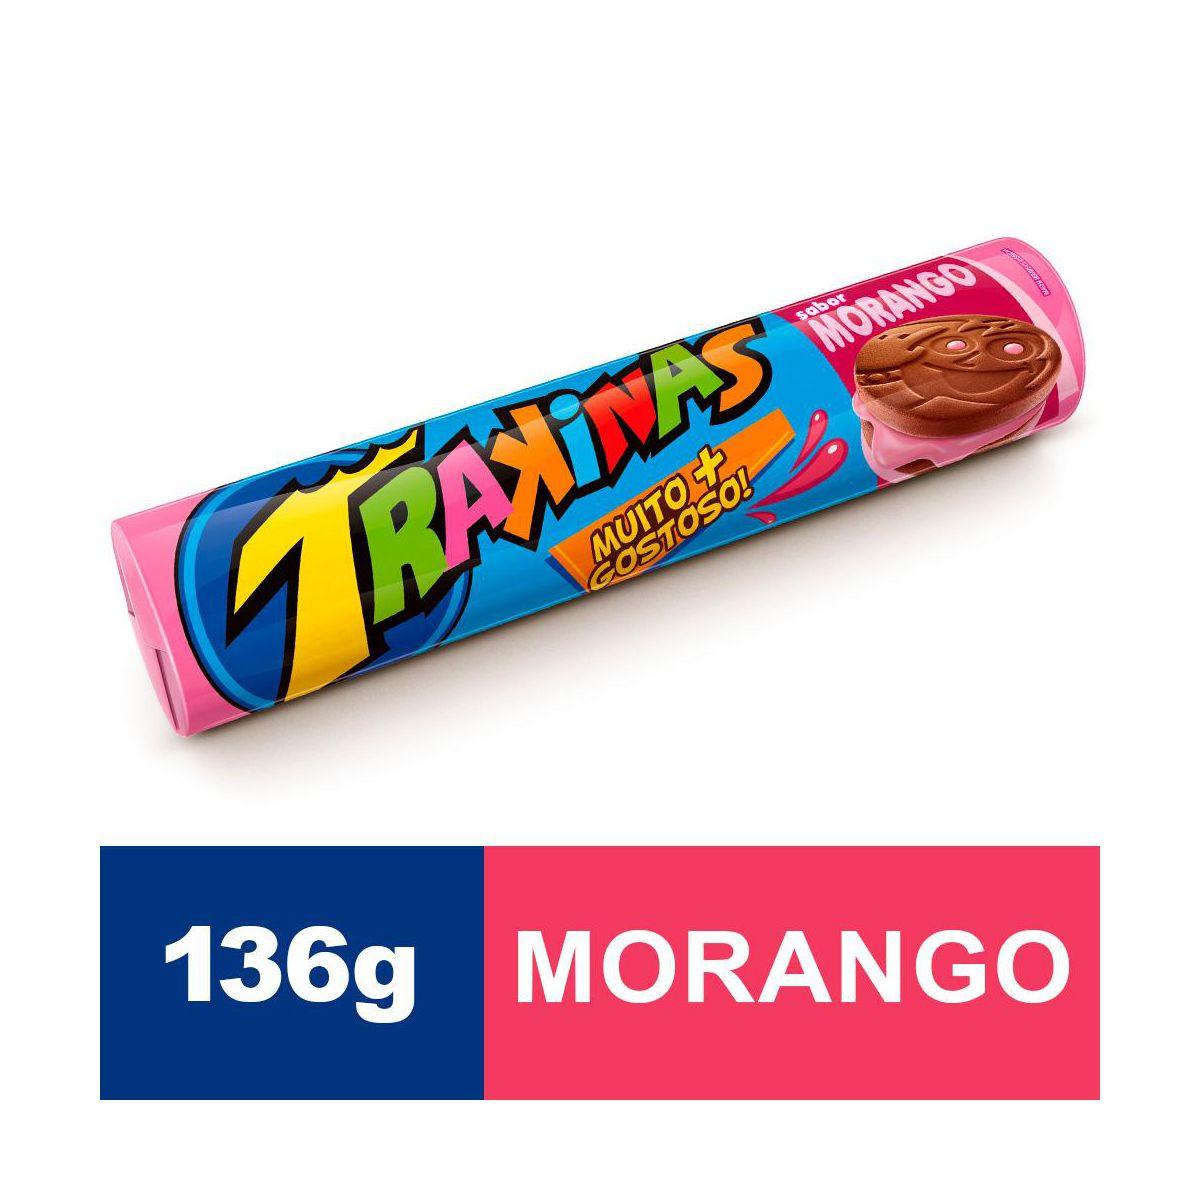 Biscoito recheado sabor morango mais pacote 136g Trakinas PCT